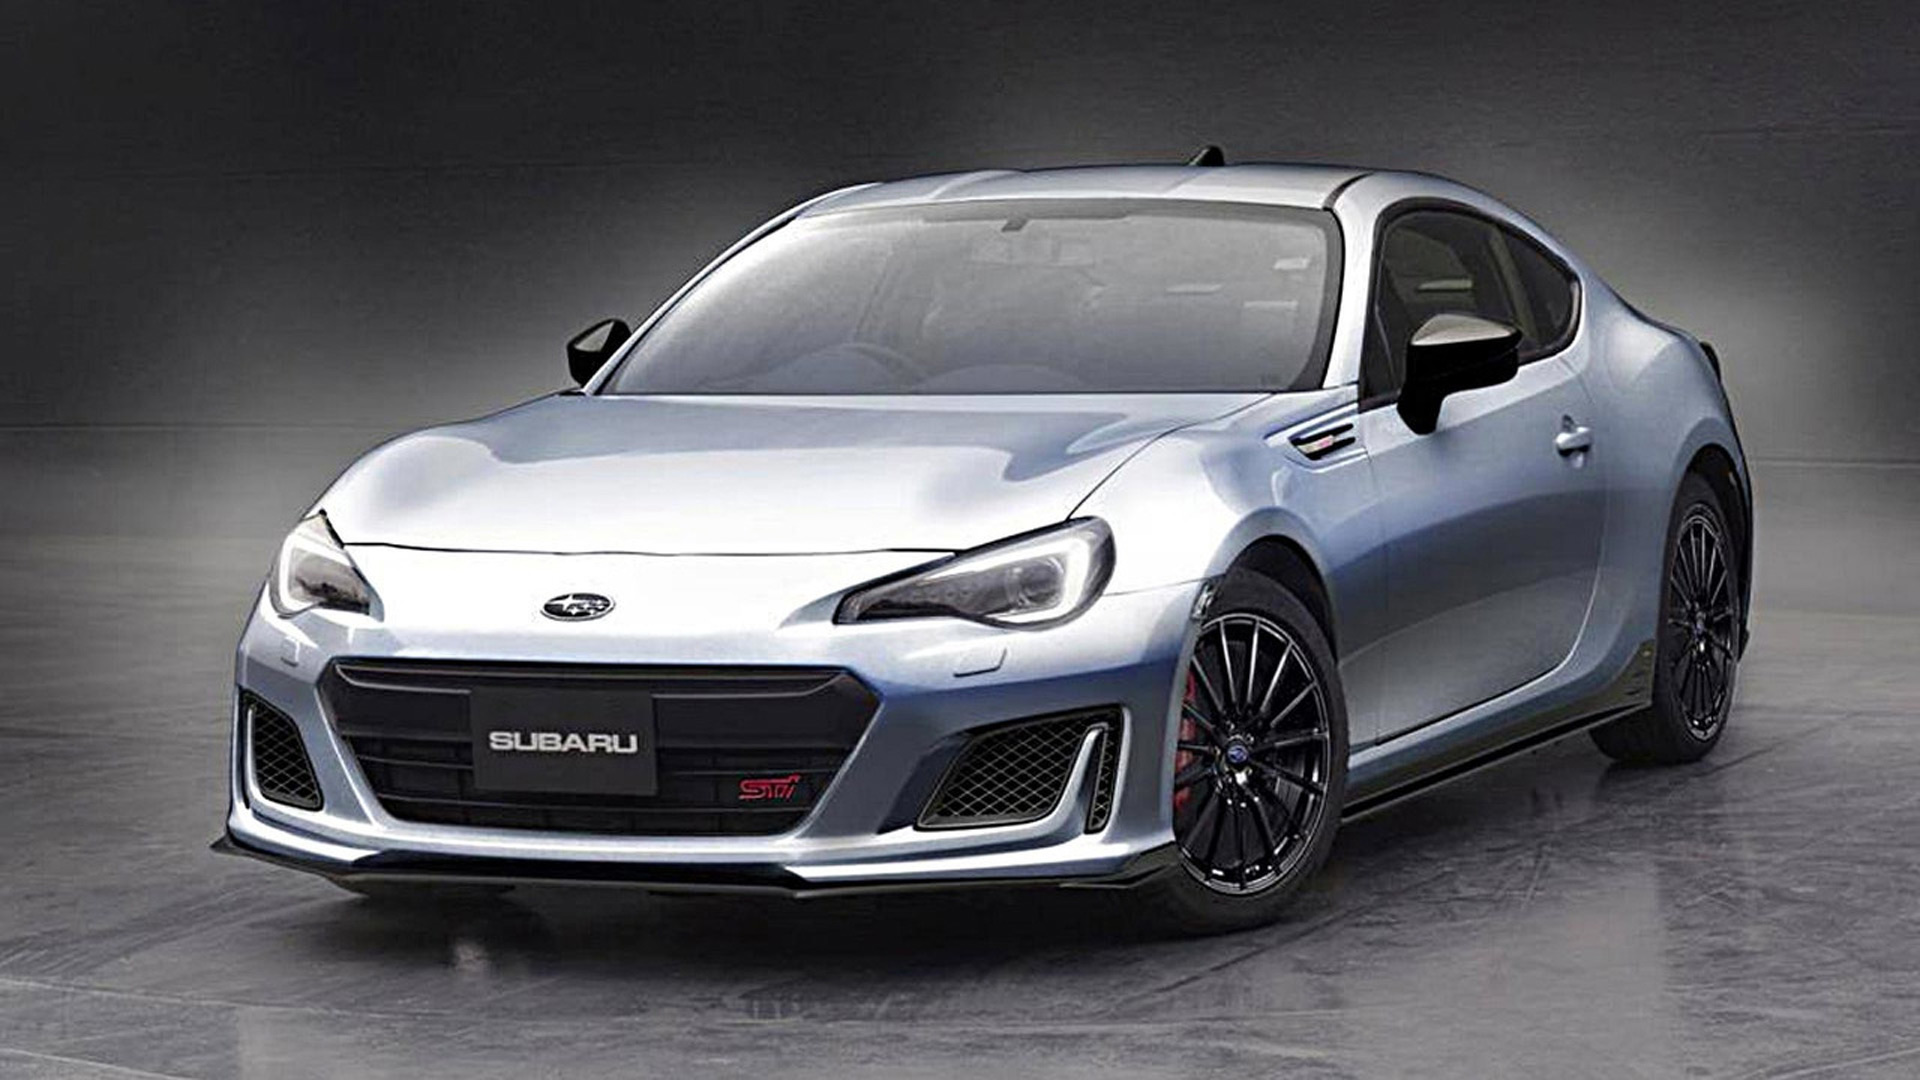 Subaru to debut BRZ STI Sport concept at 2017 Tokyo Auto Salon